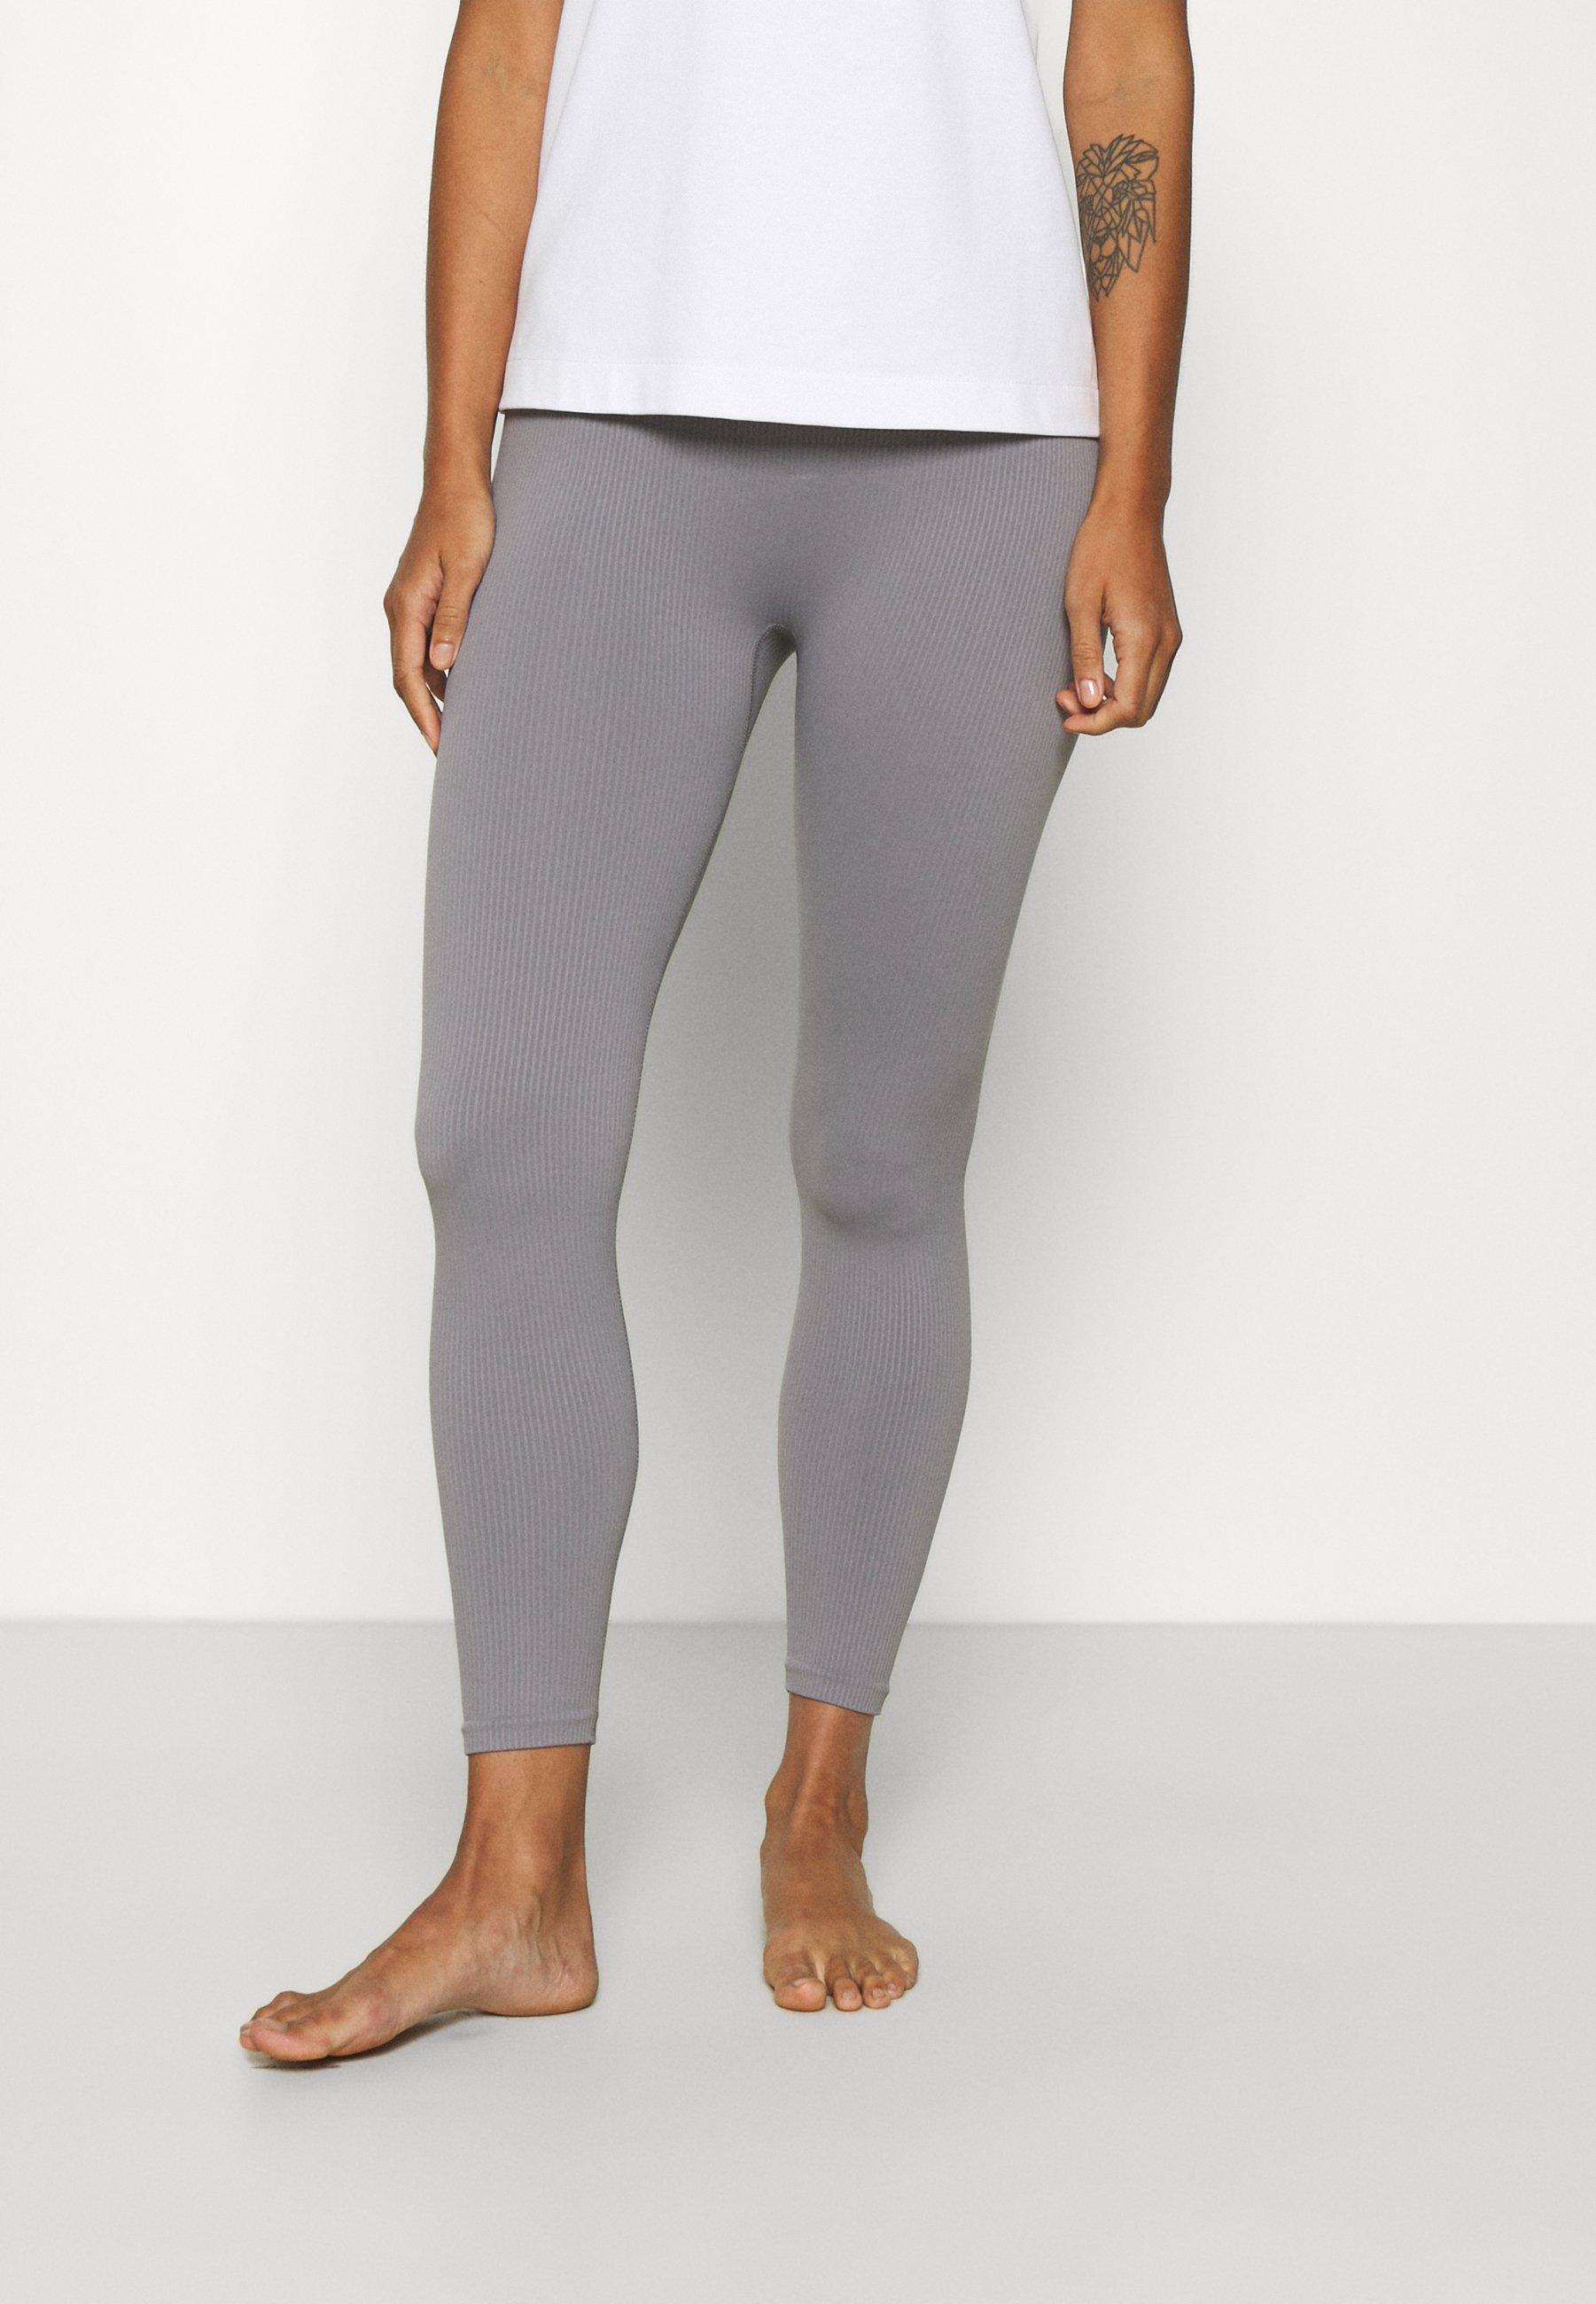 Women RIBBED 7/8 LEGGING - Leggings - Stockings